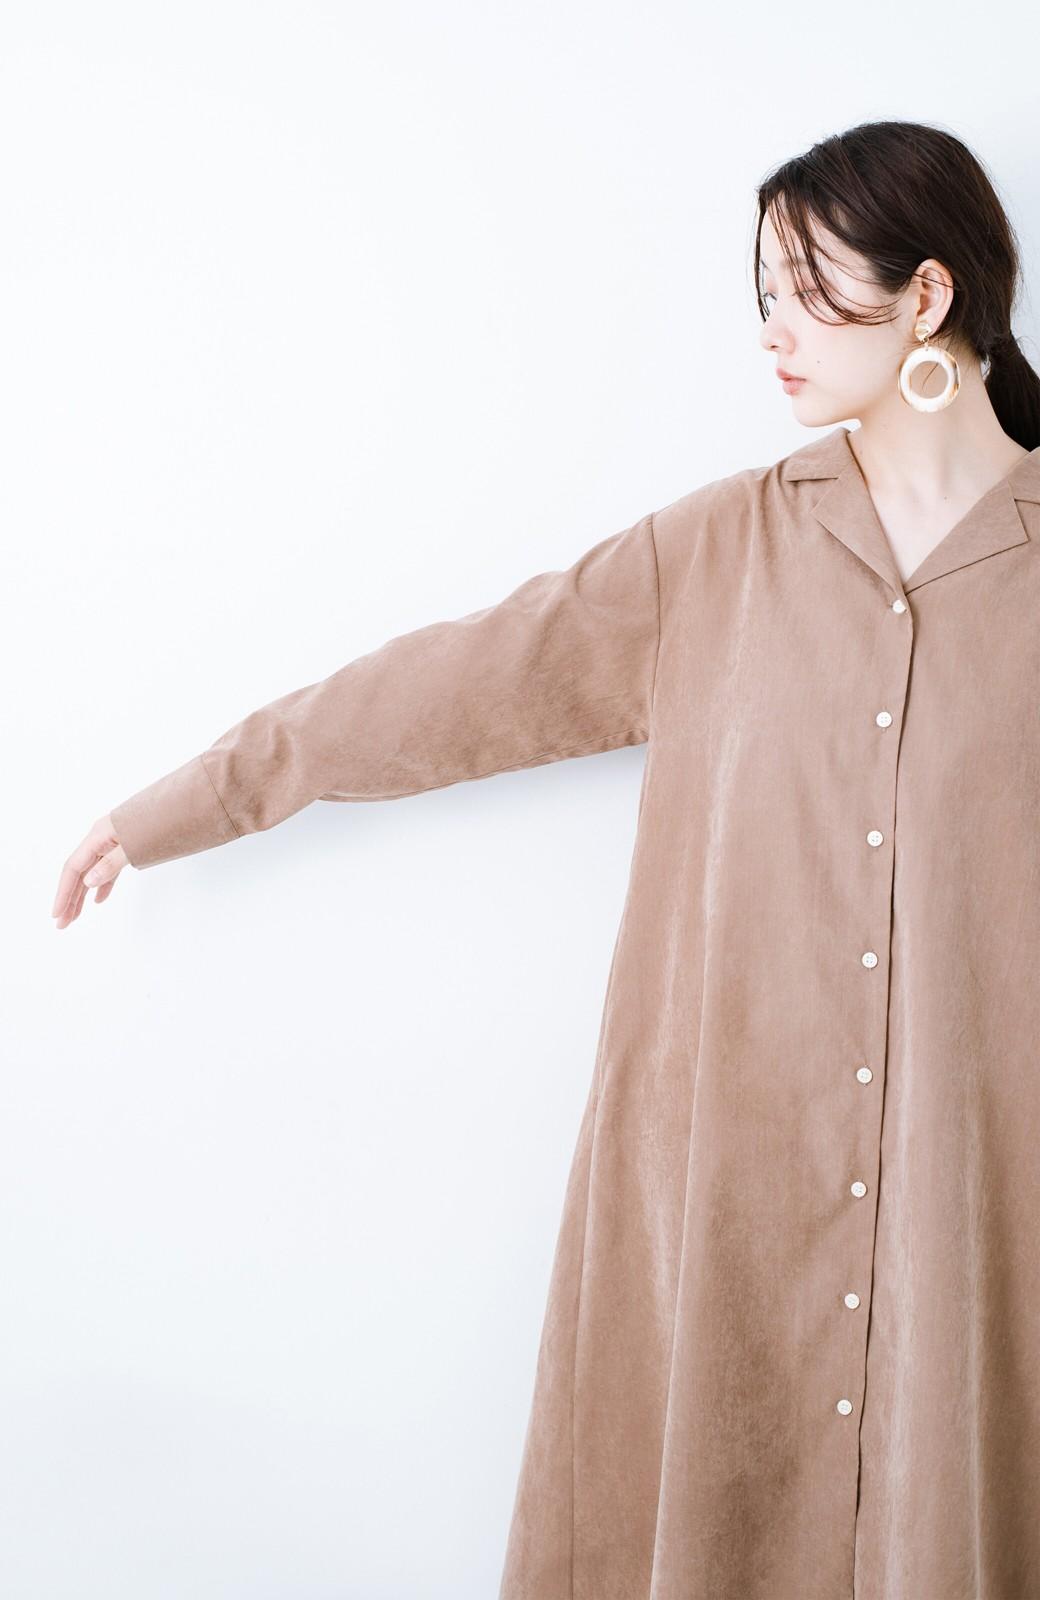 haco! 太ってもばれずに羽織っても便利なAラインワンピース <ブラウン>の商品写真21